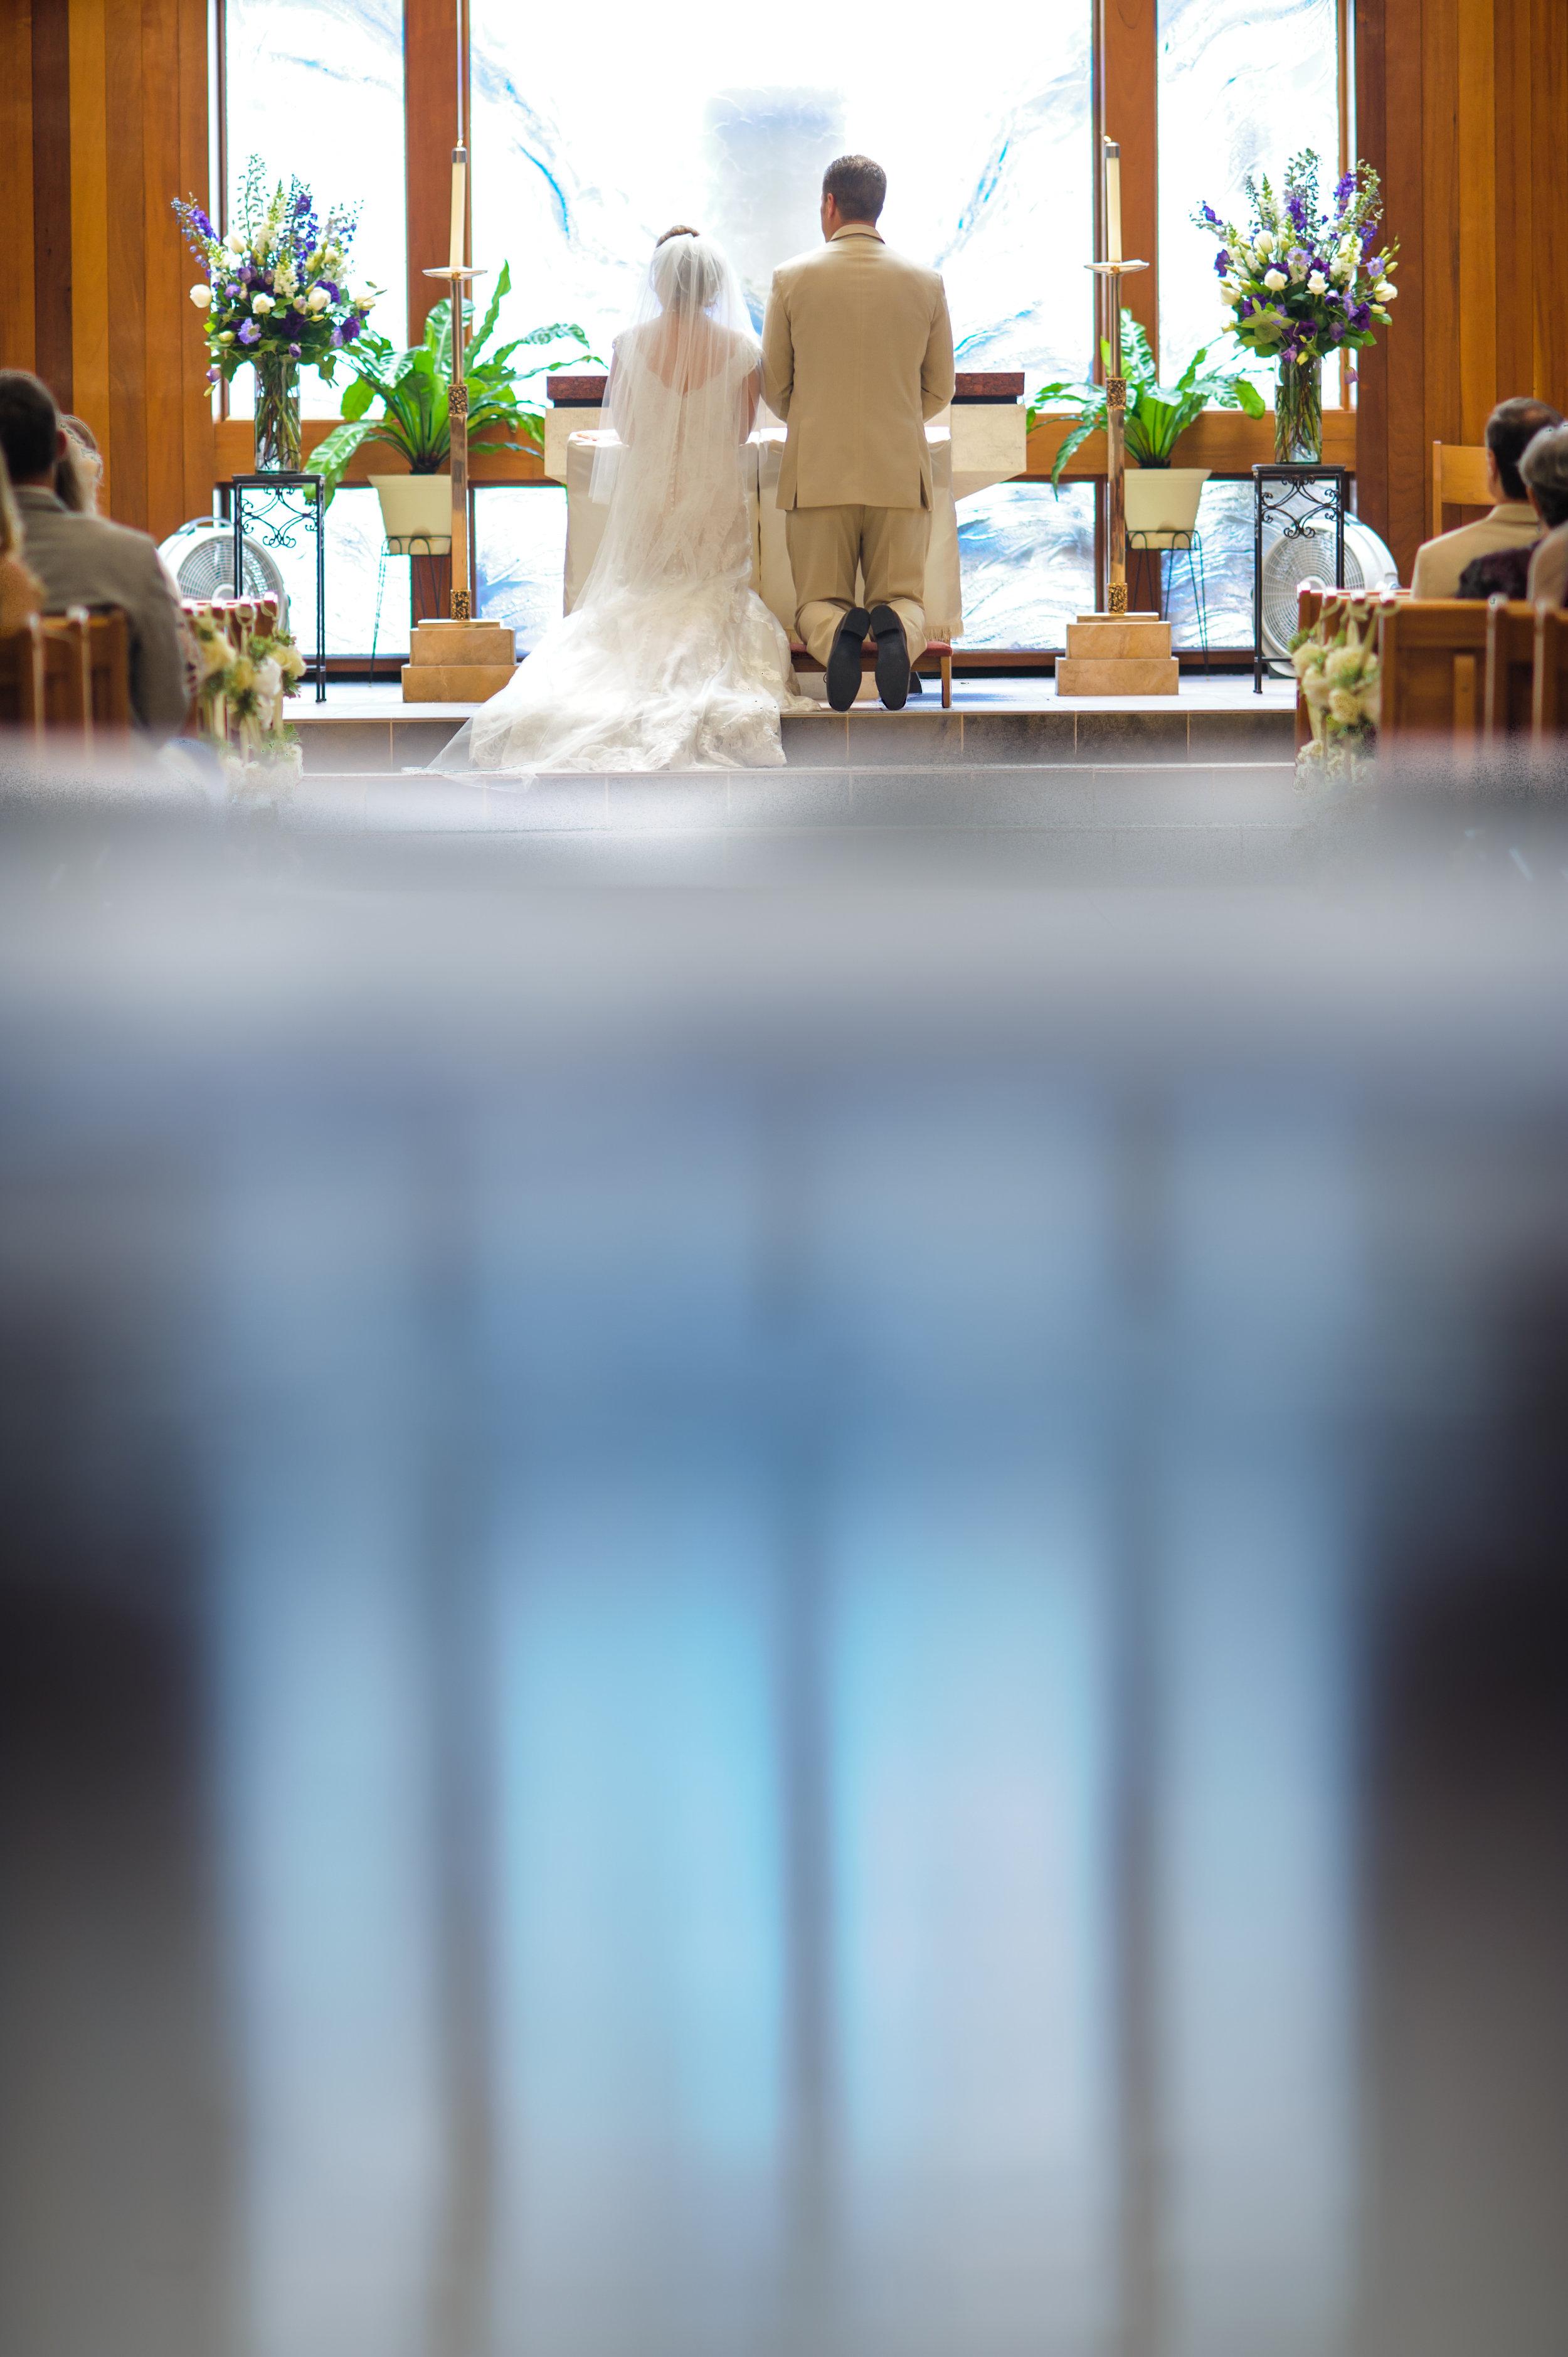 danielle-ross-005-sacramento-wedding-photographer-katherine-nicole-photography.JPG